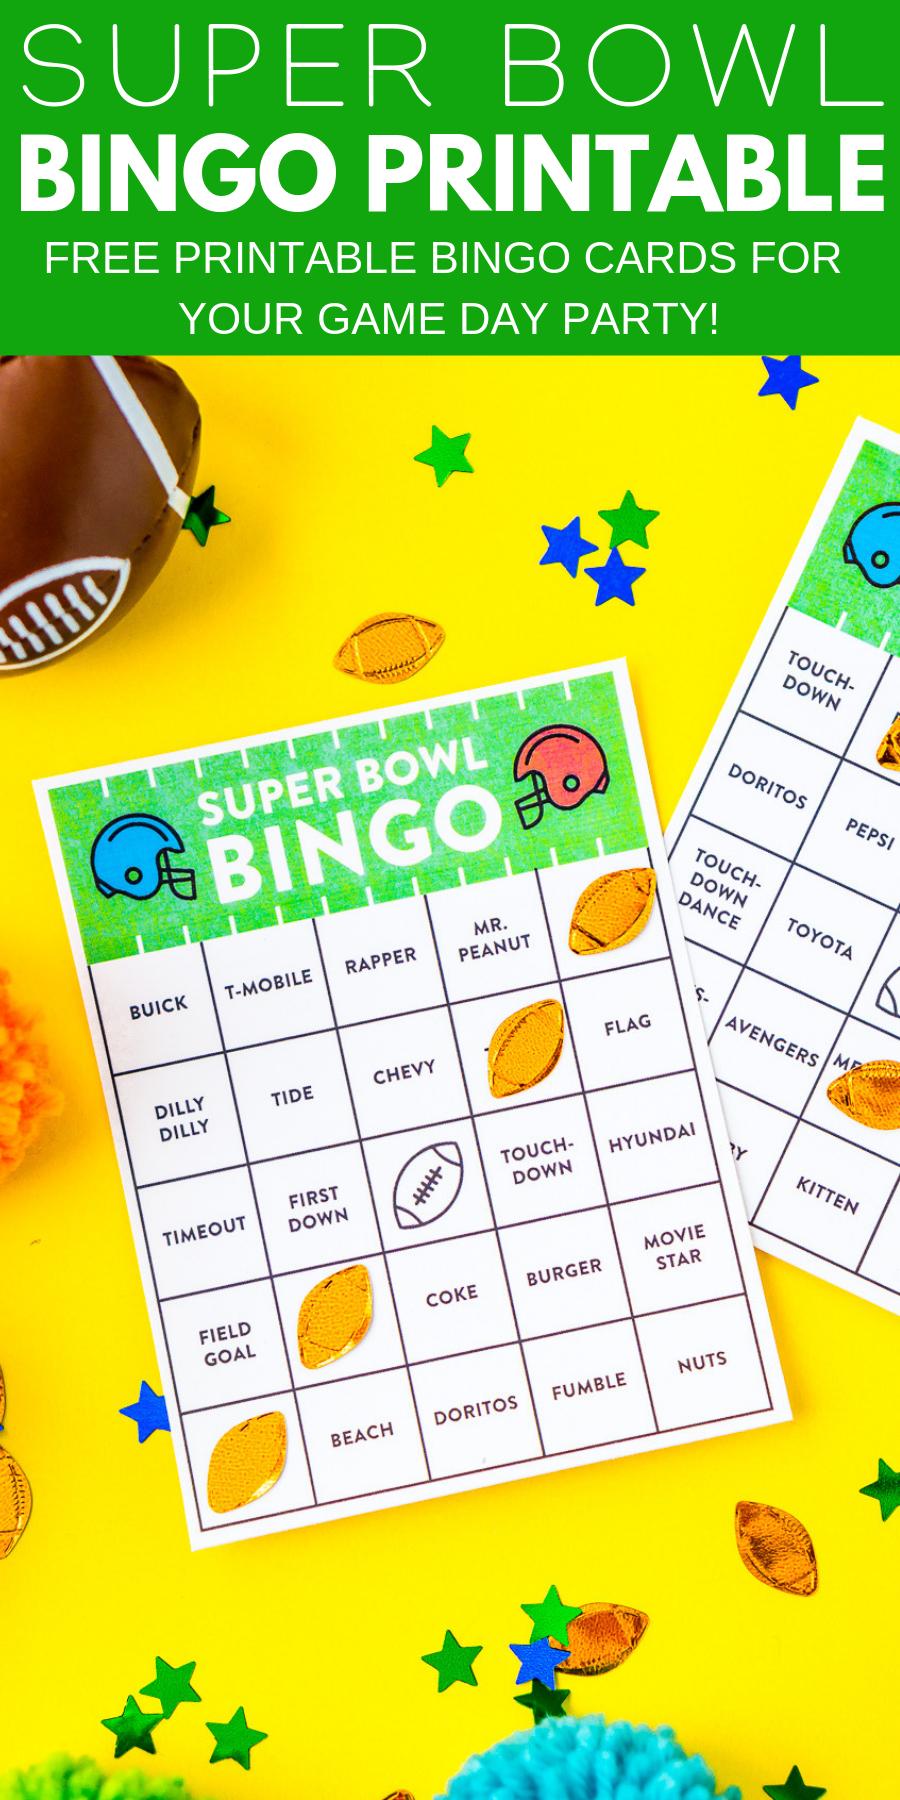 image relating to Printable Super Bowl Bingo Cards named Tremendous Bowl Bingo Playing cards Free of charge Printable Sugar Soul